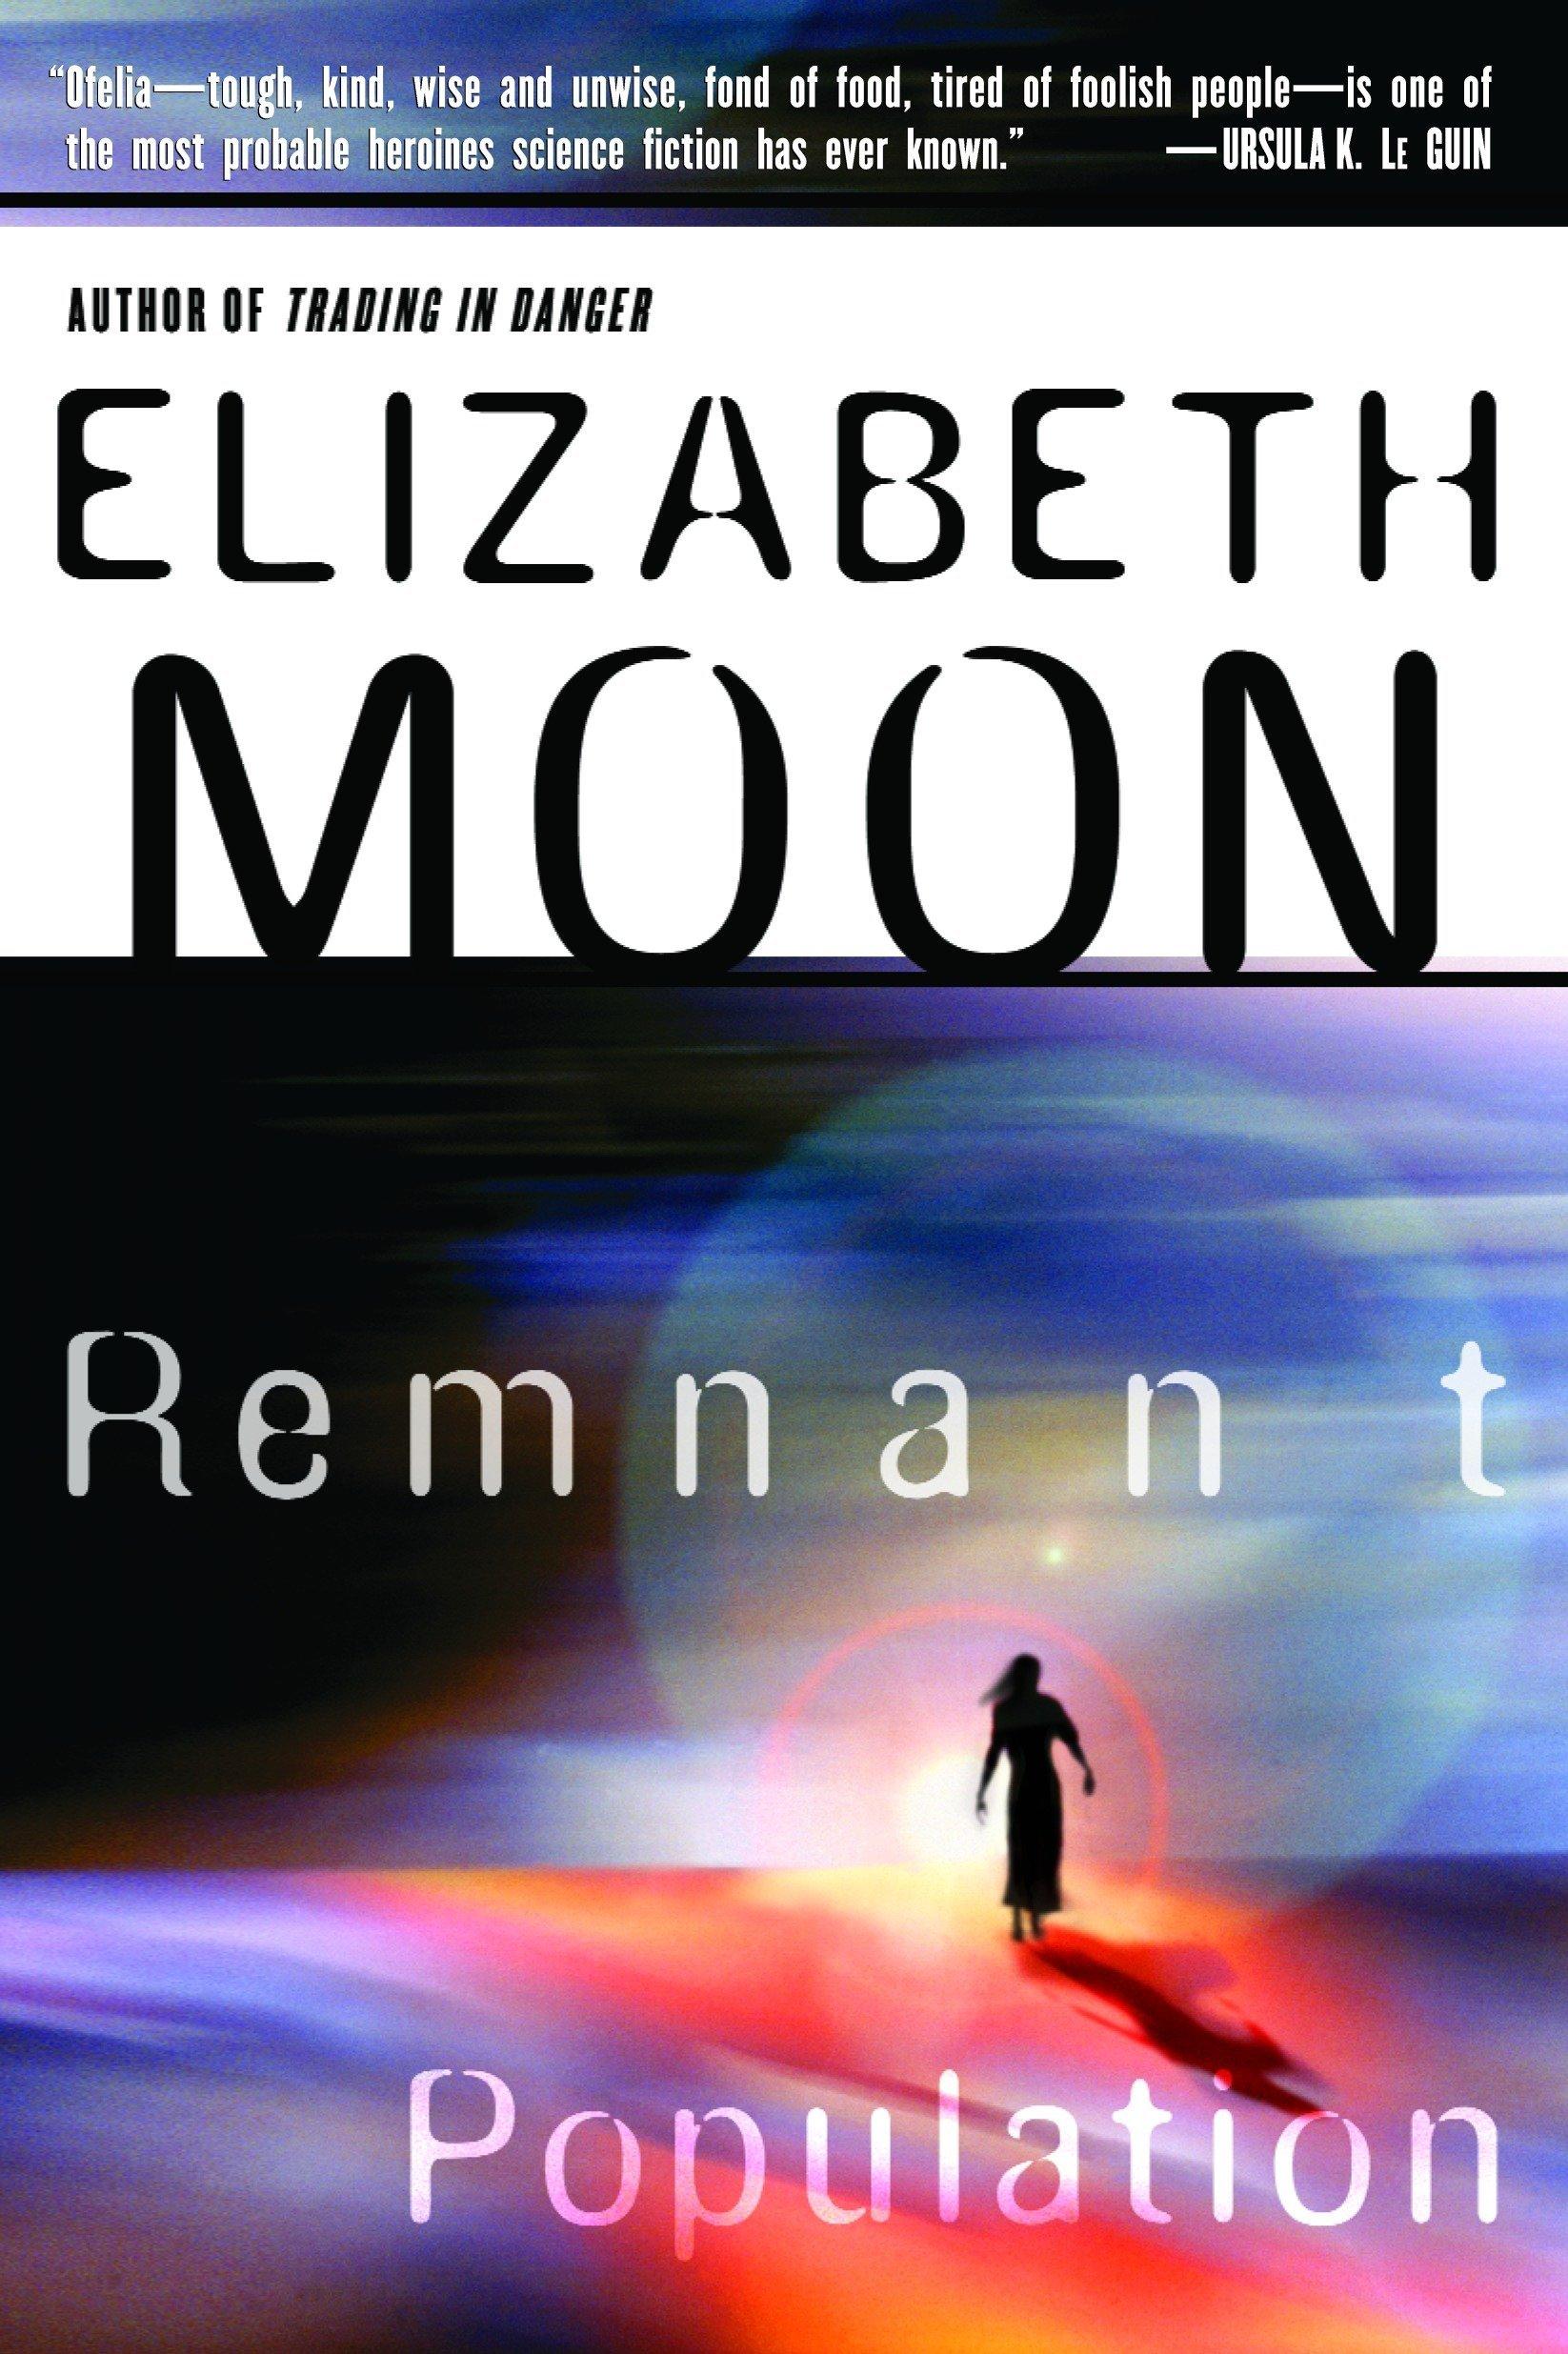 Amazon.com: Remnant Population: A Novel (9780345462190 ...